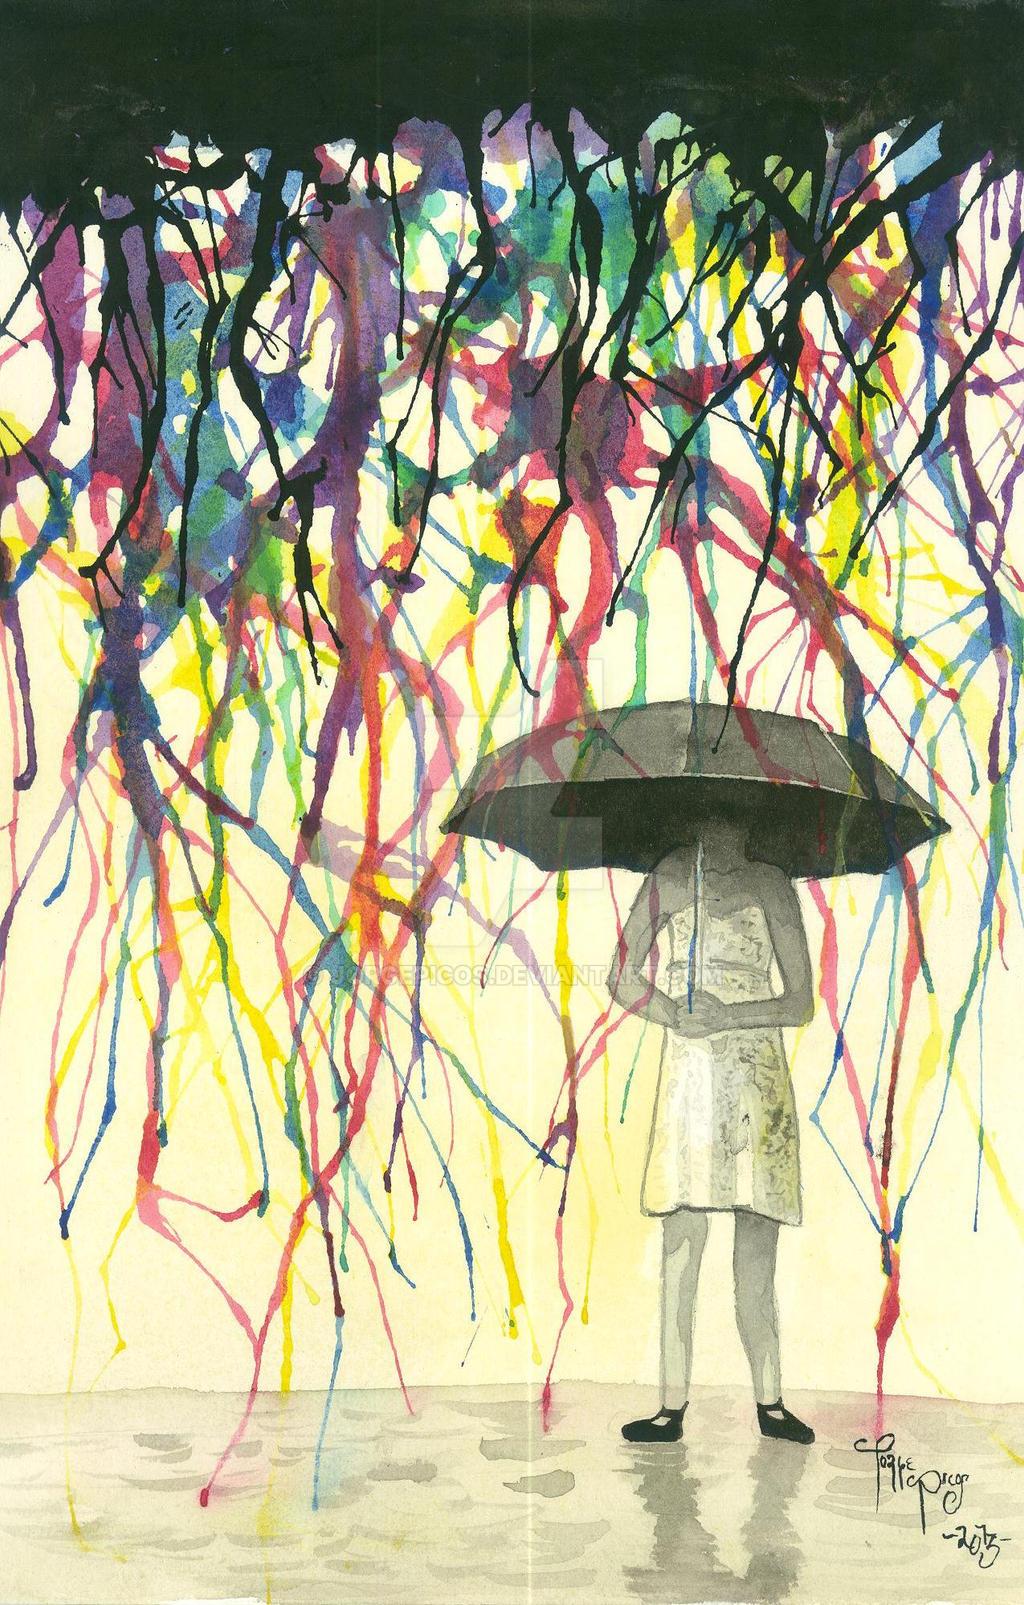 Colorful Rain by JorgePicos